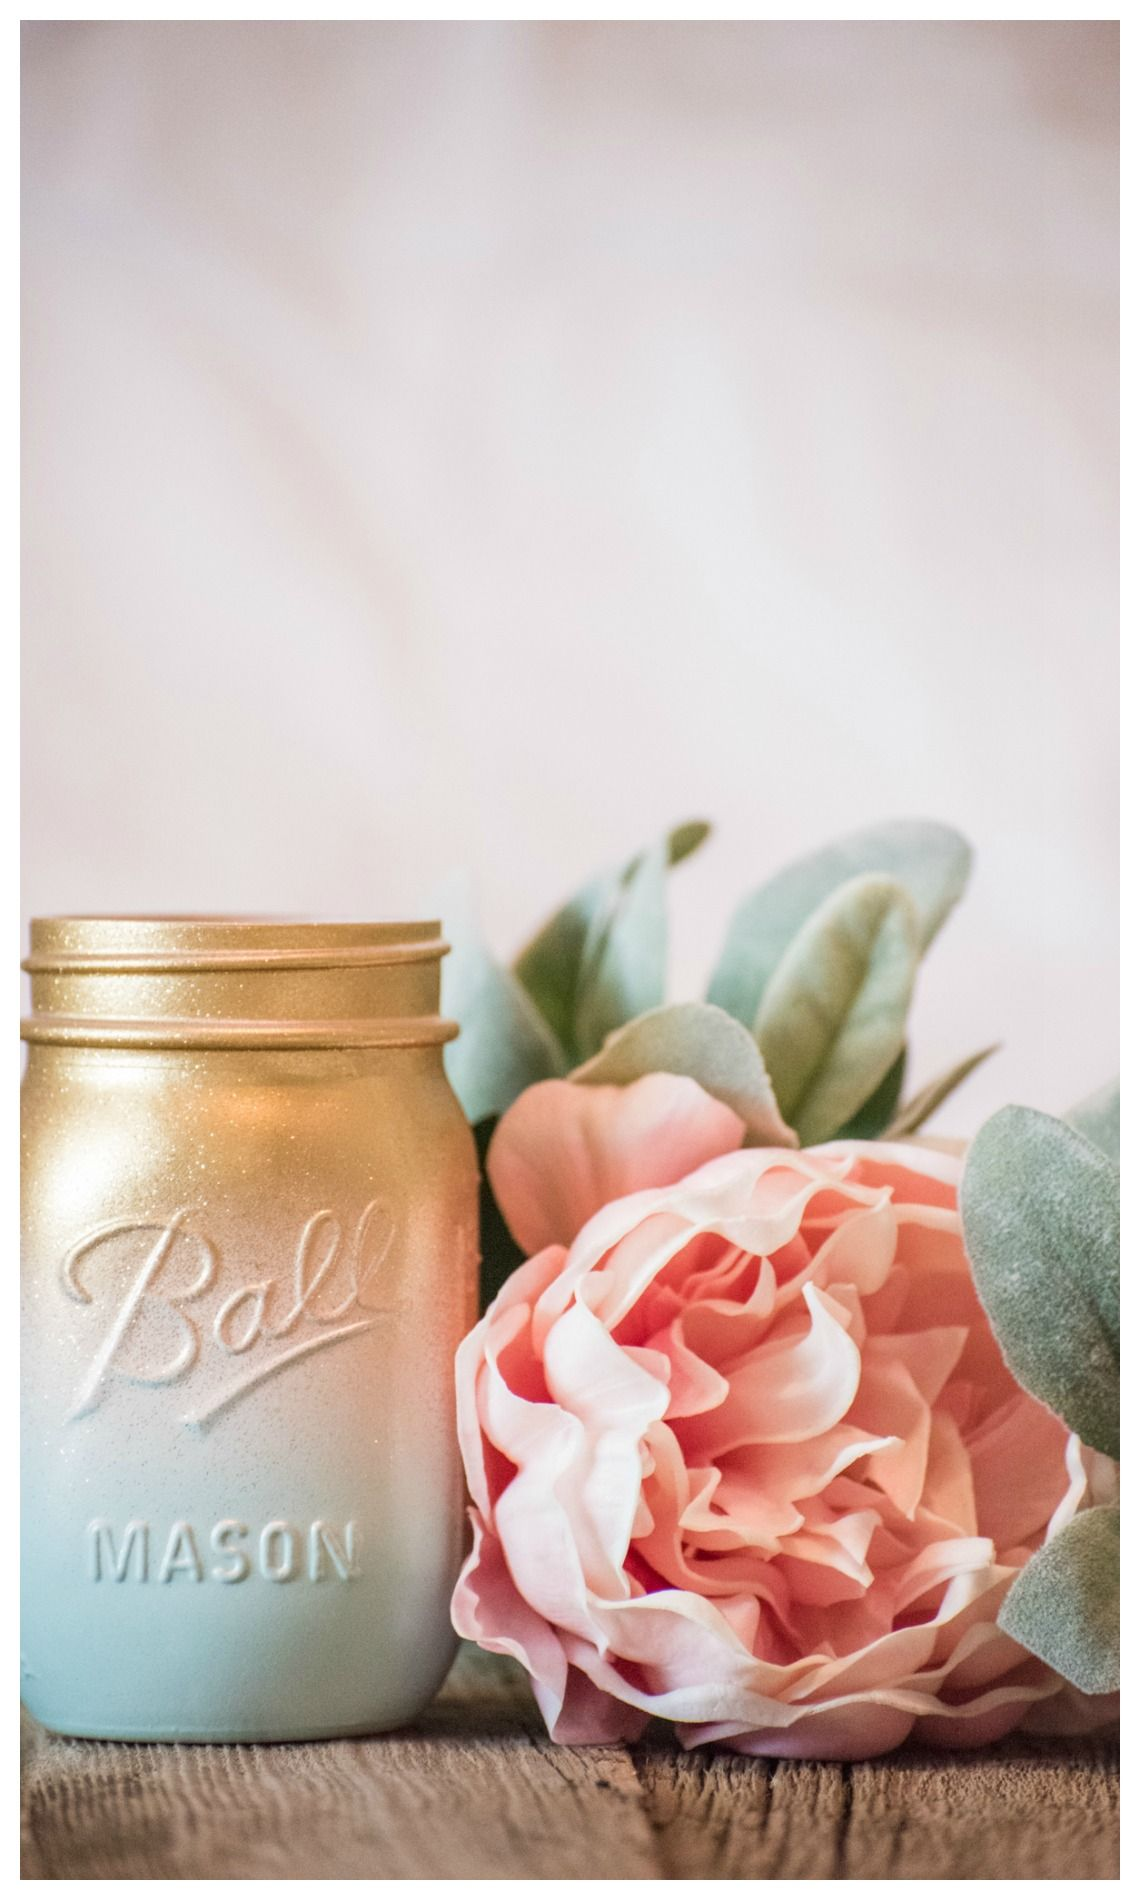 Easter Mason Jar Centerpiece Vase Flowers Blue Peach Gold Glitter ...